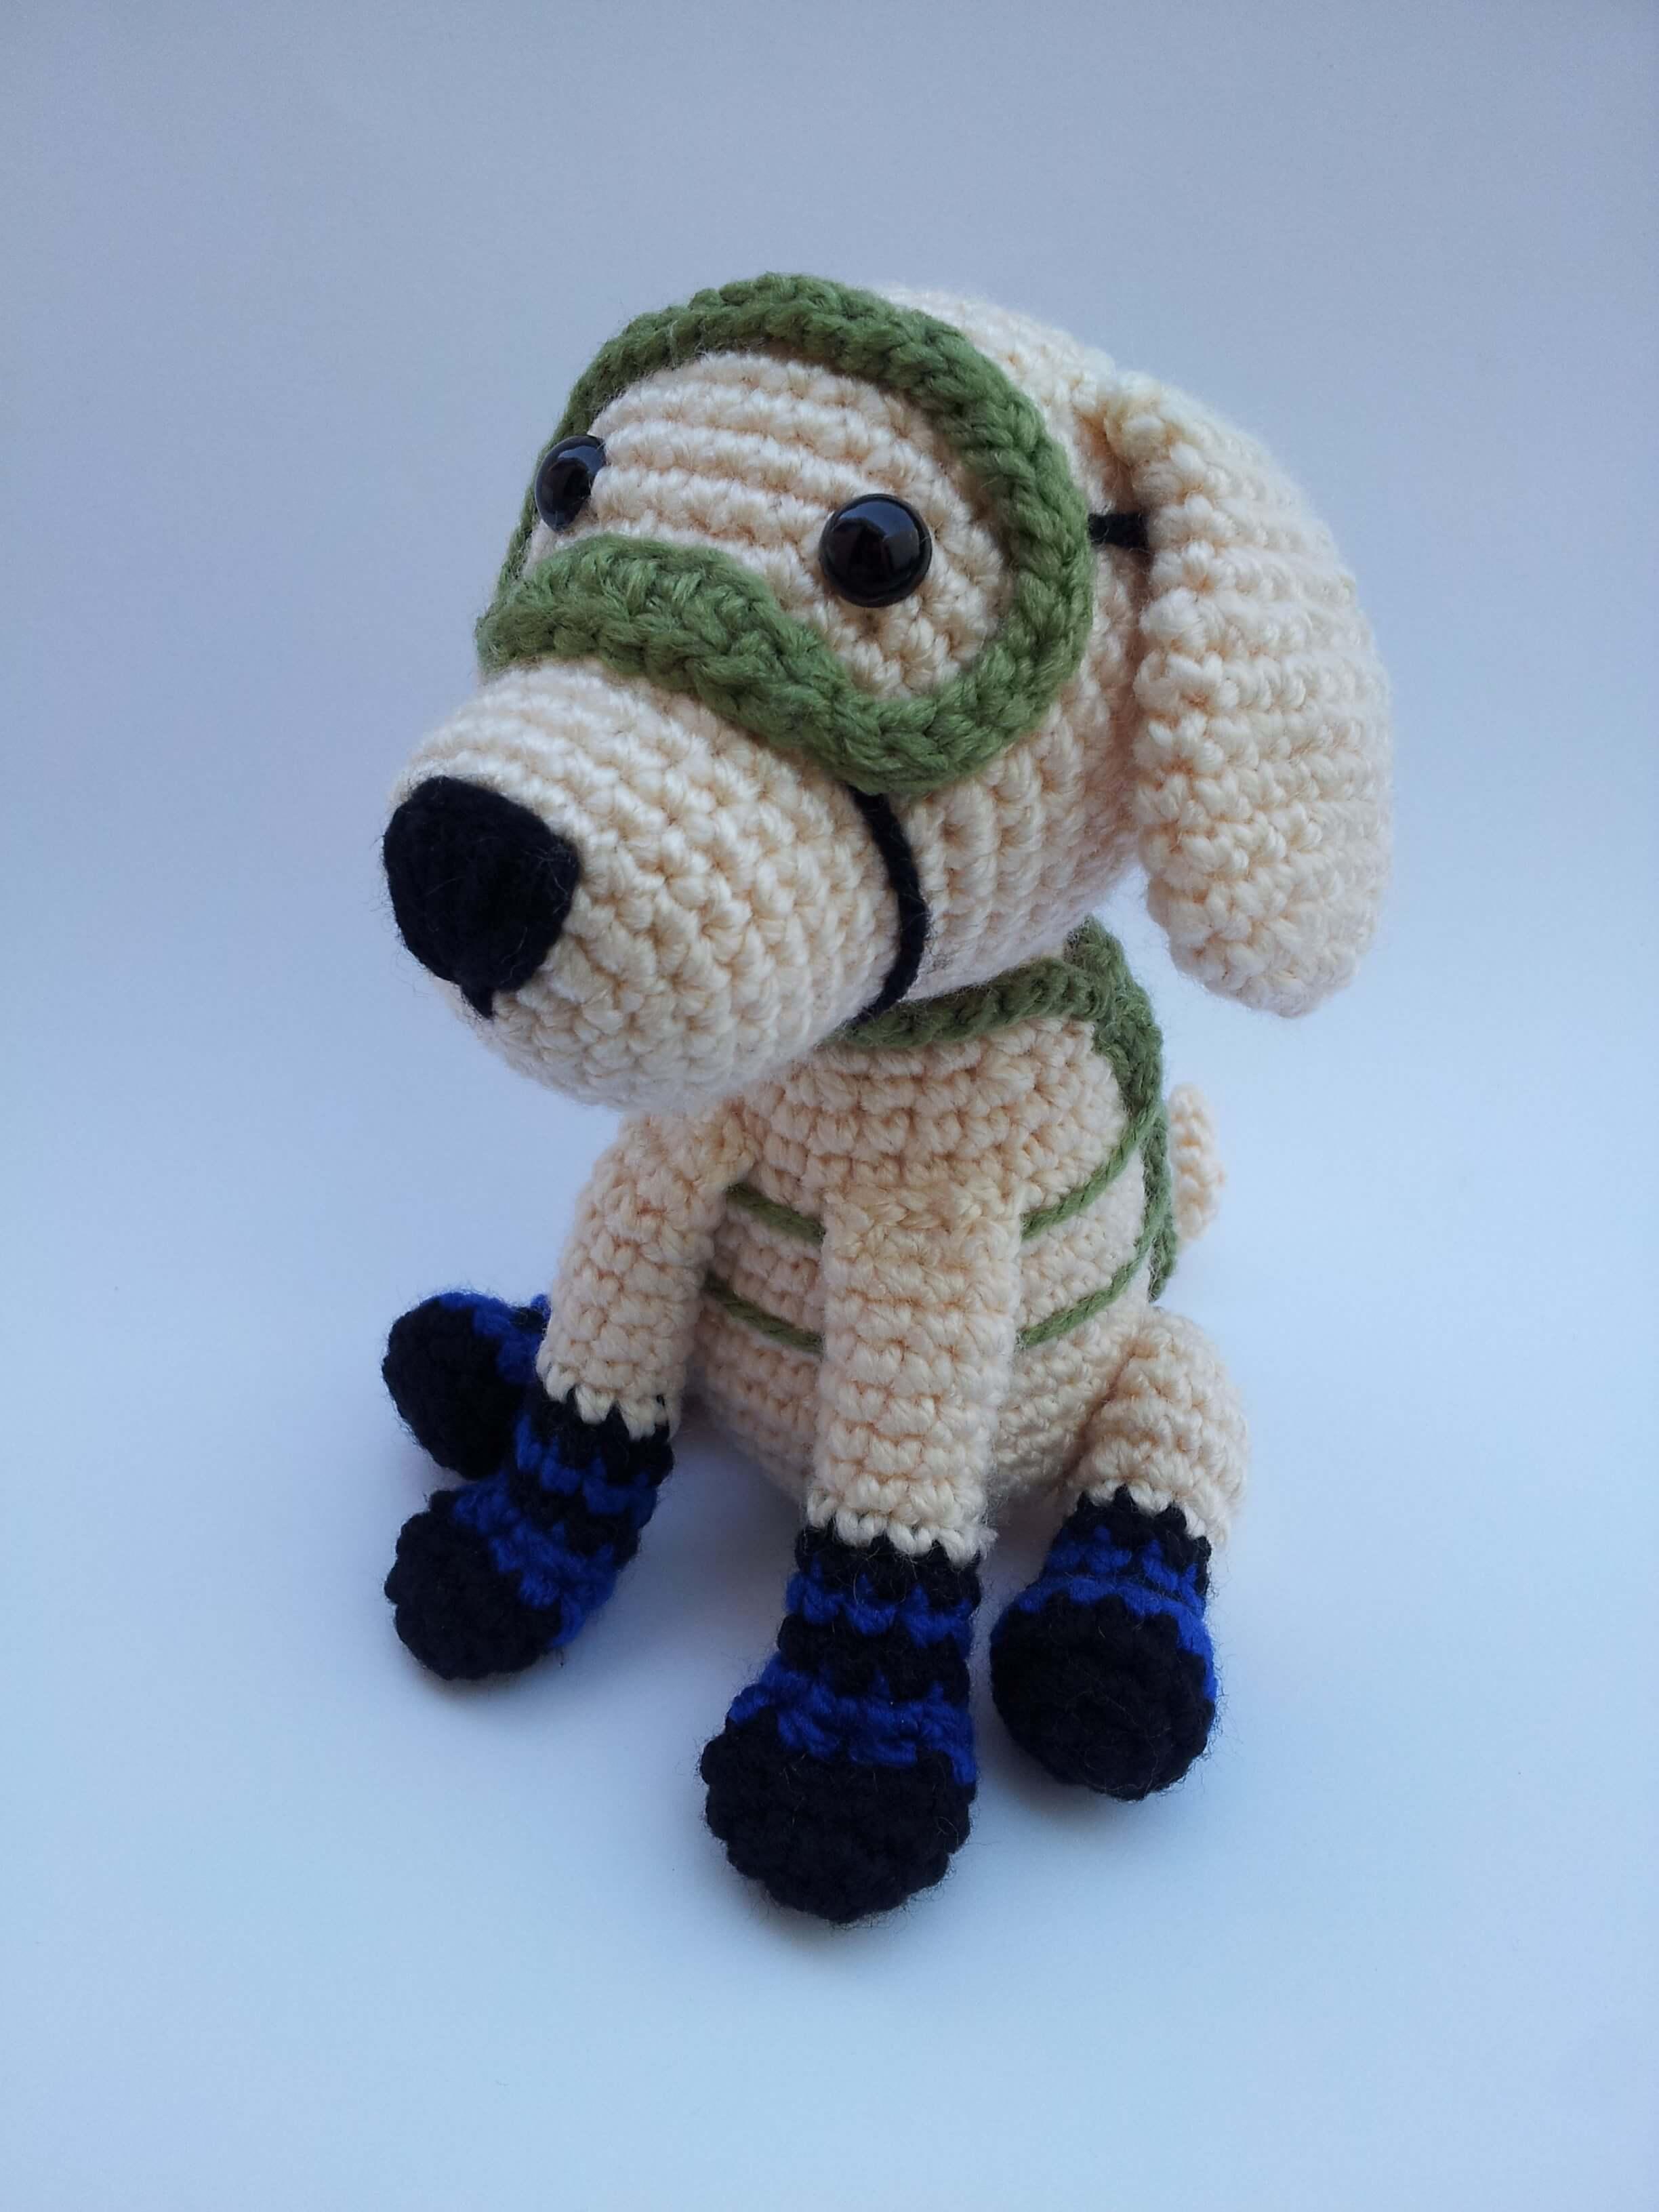 Pug dog amigurumi tutorial | Amiguroom Toys | 3264x2448